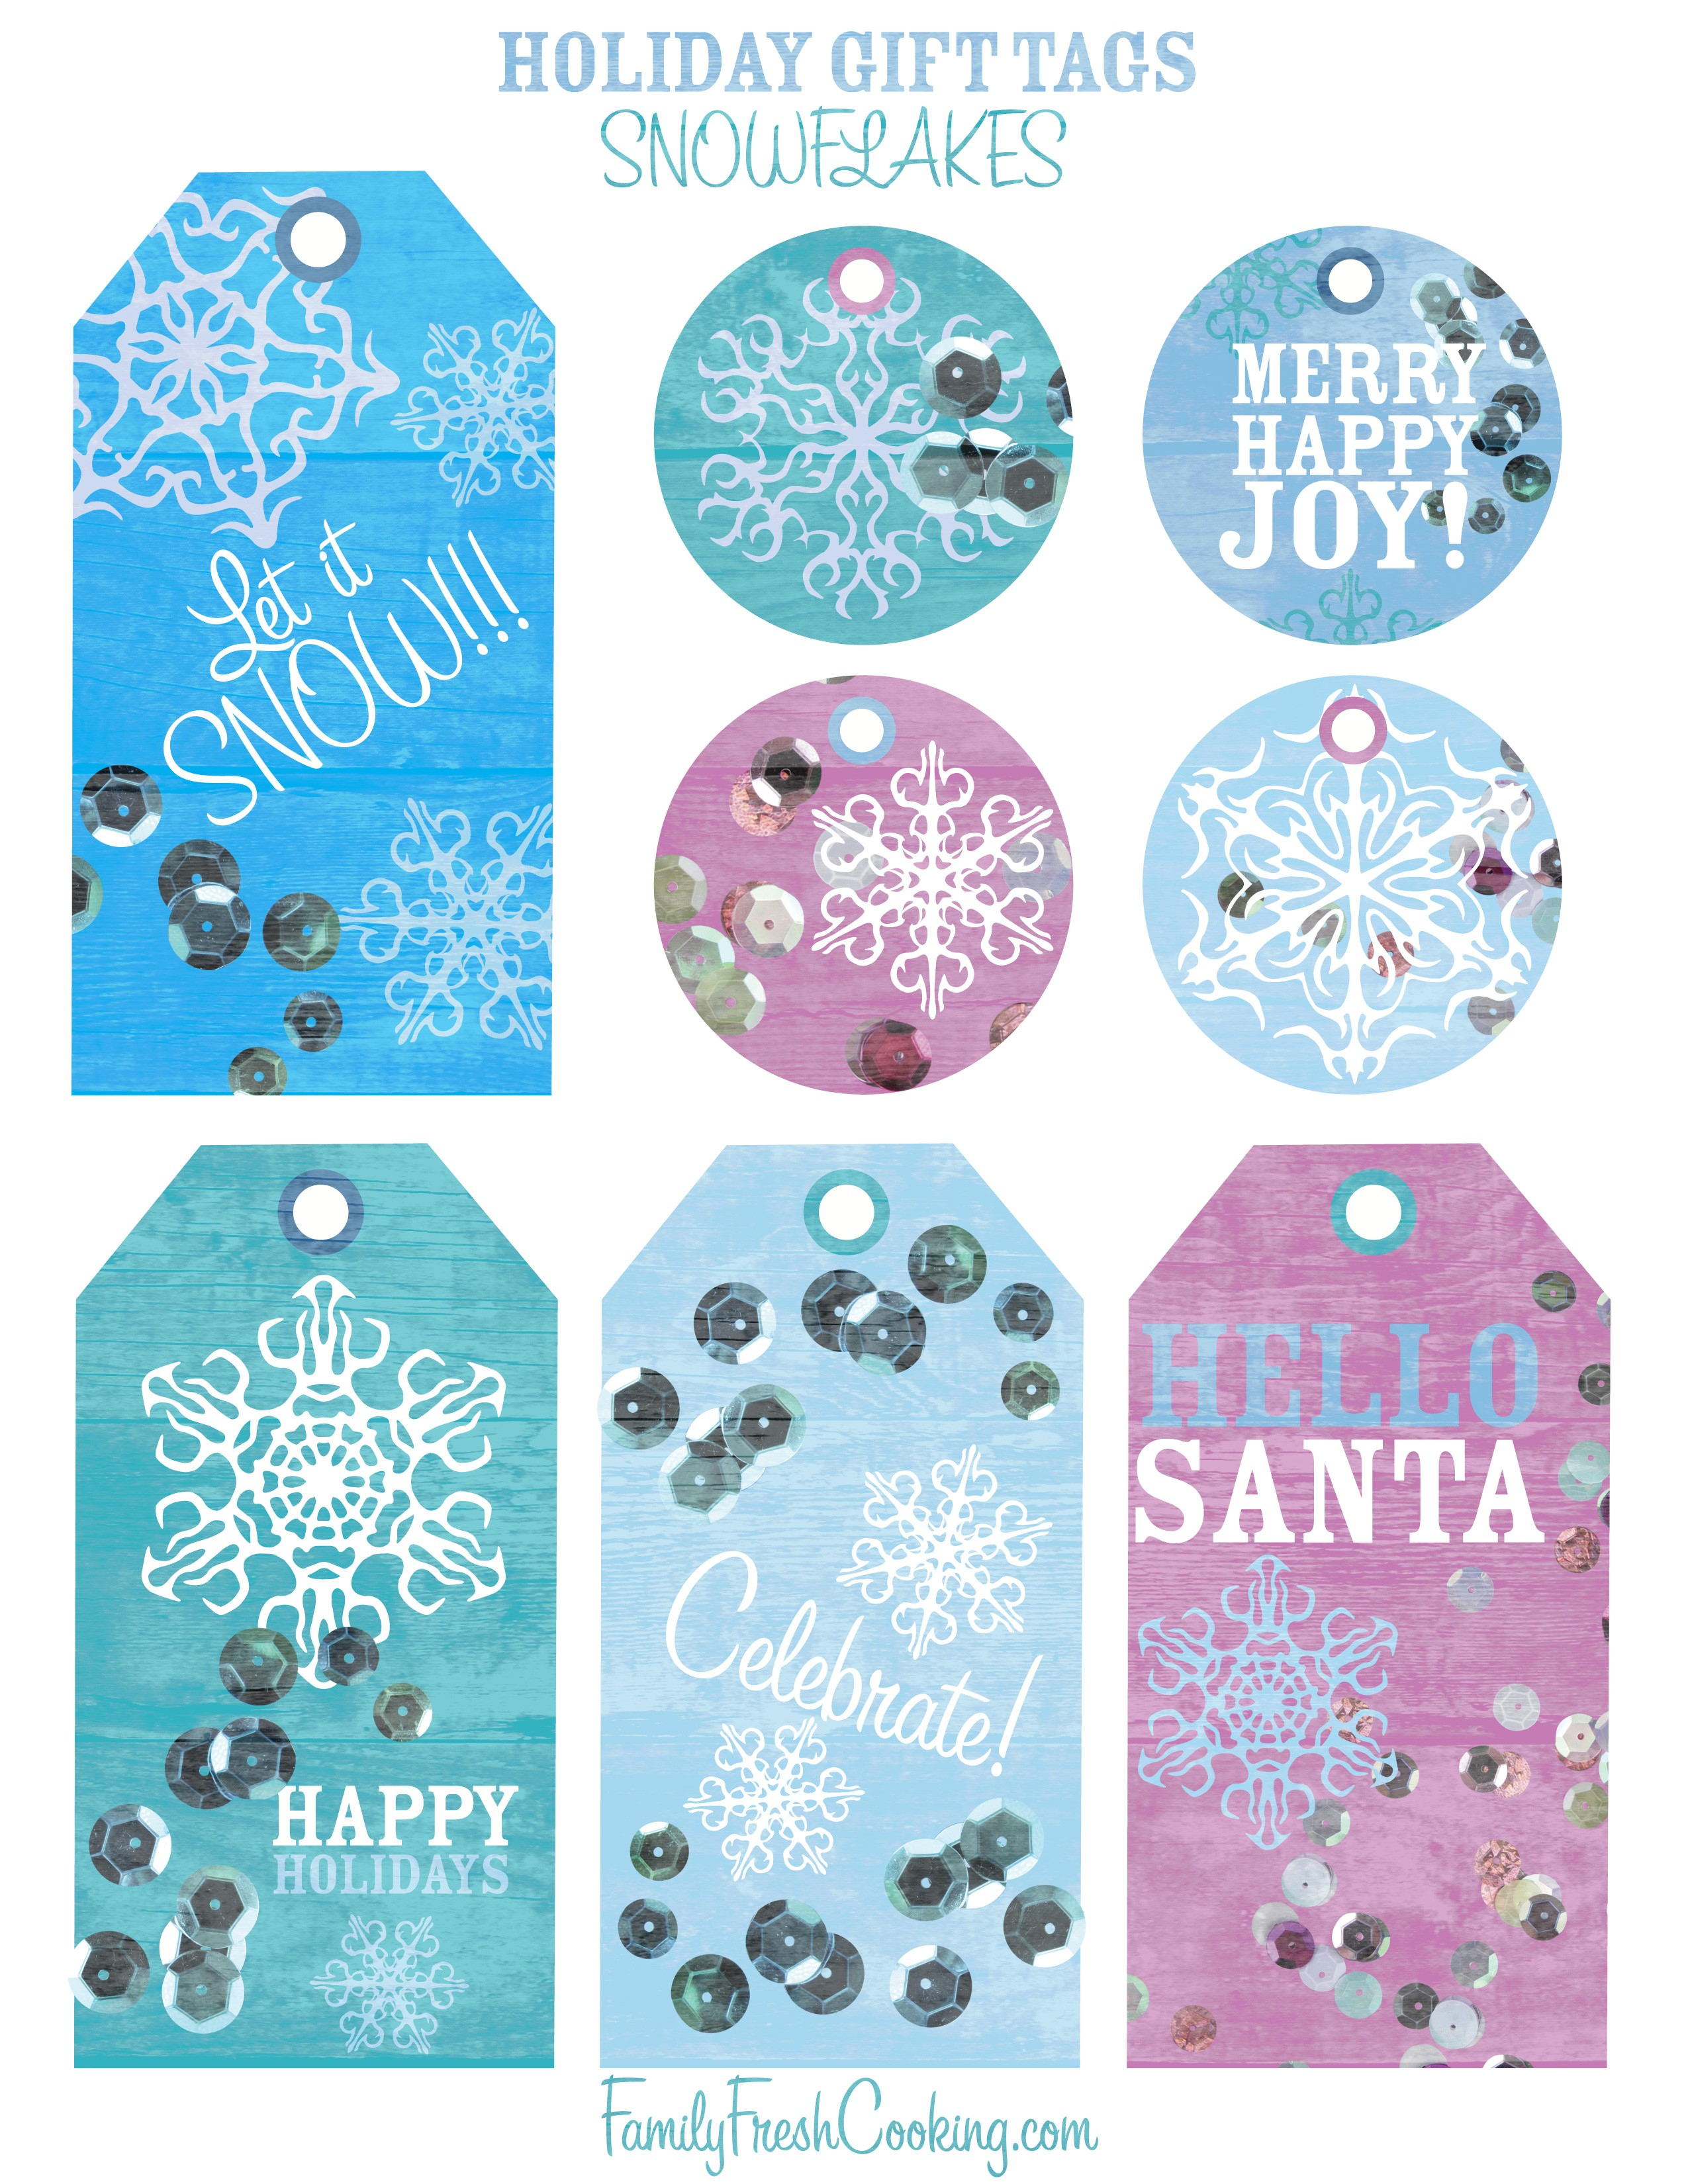 Snowflakes ~ Free Printable Holiday Gift Tags - Marla Meridith - Free Printable Gift Tags